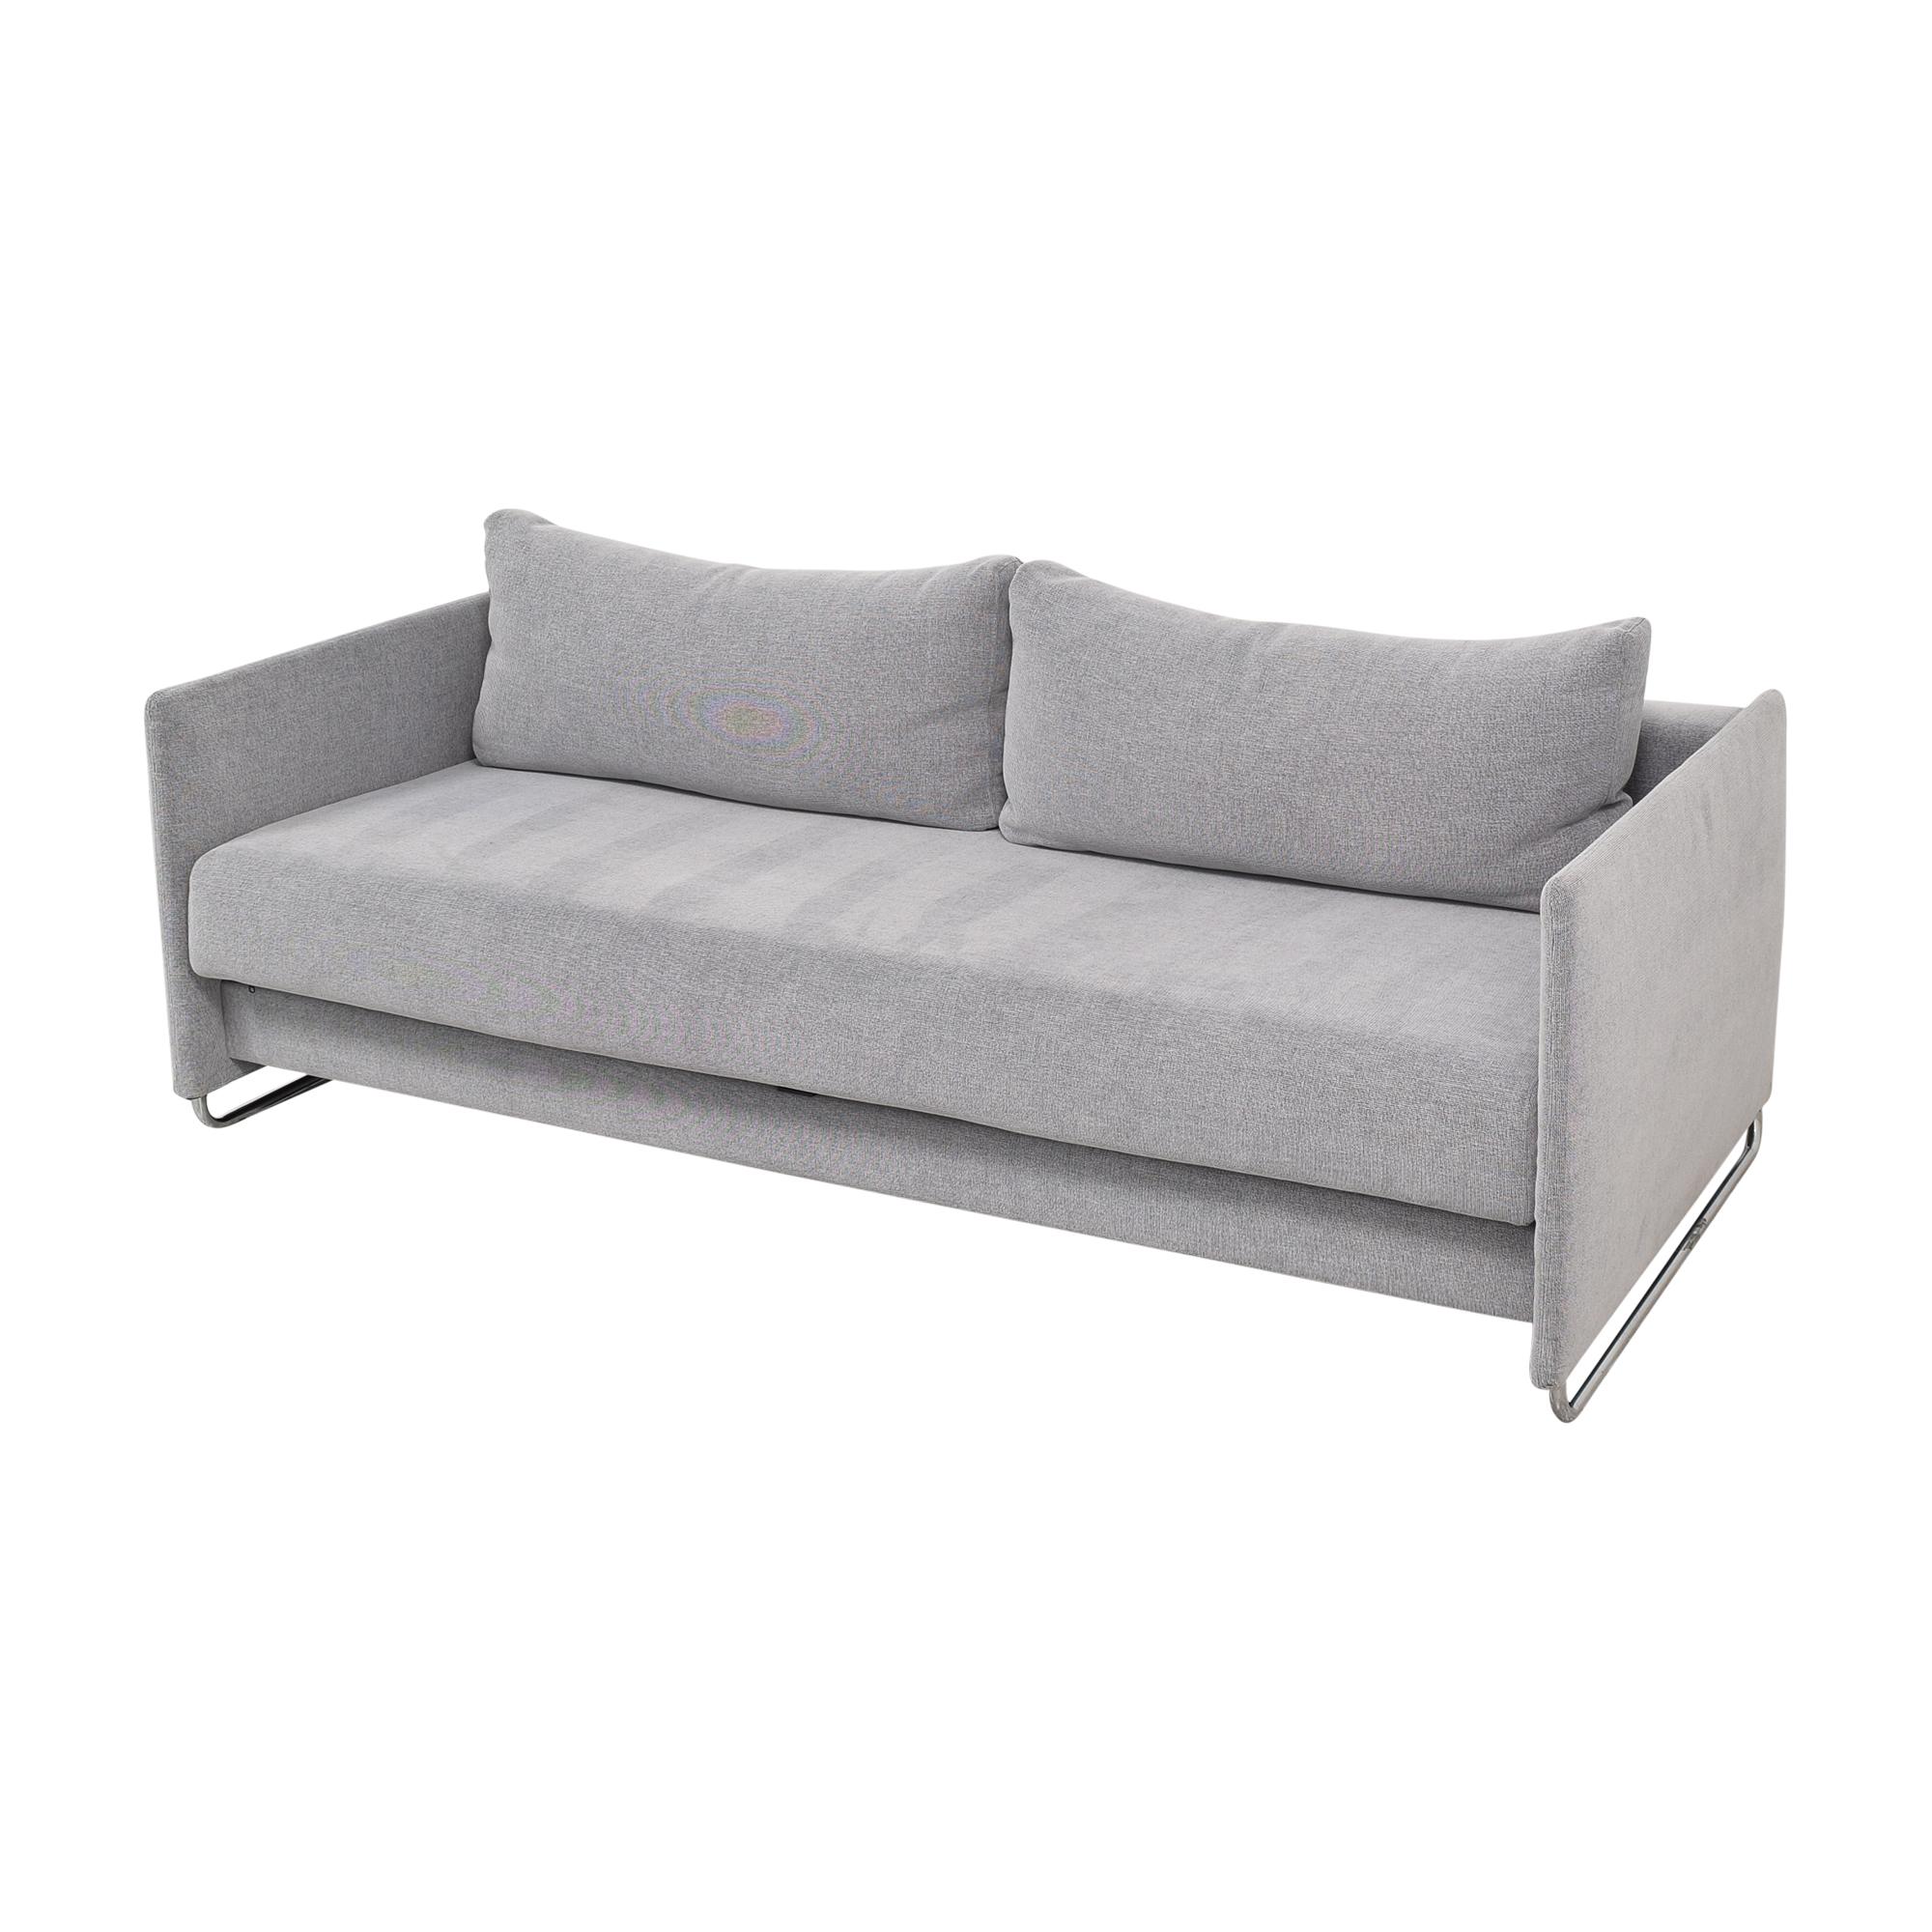 CB2 CB2 Tandom Microgrid Sleeper Sofa coupon